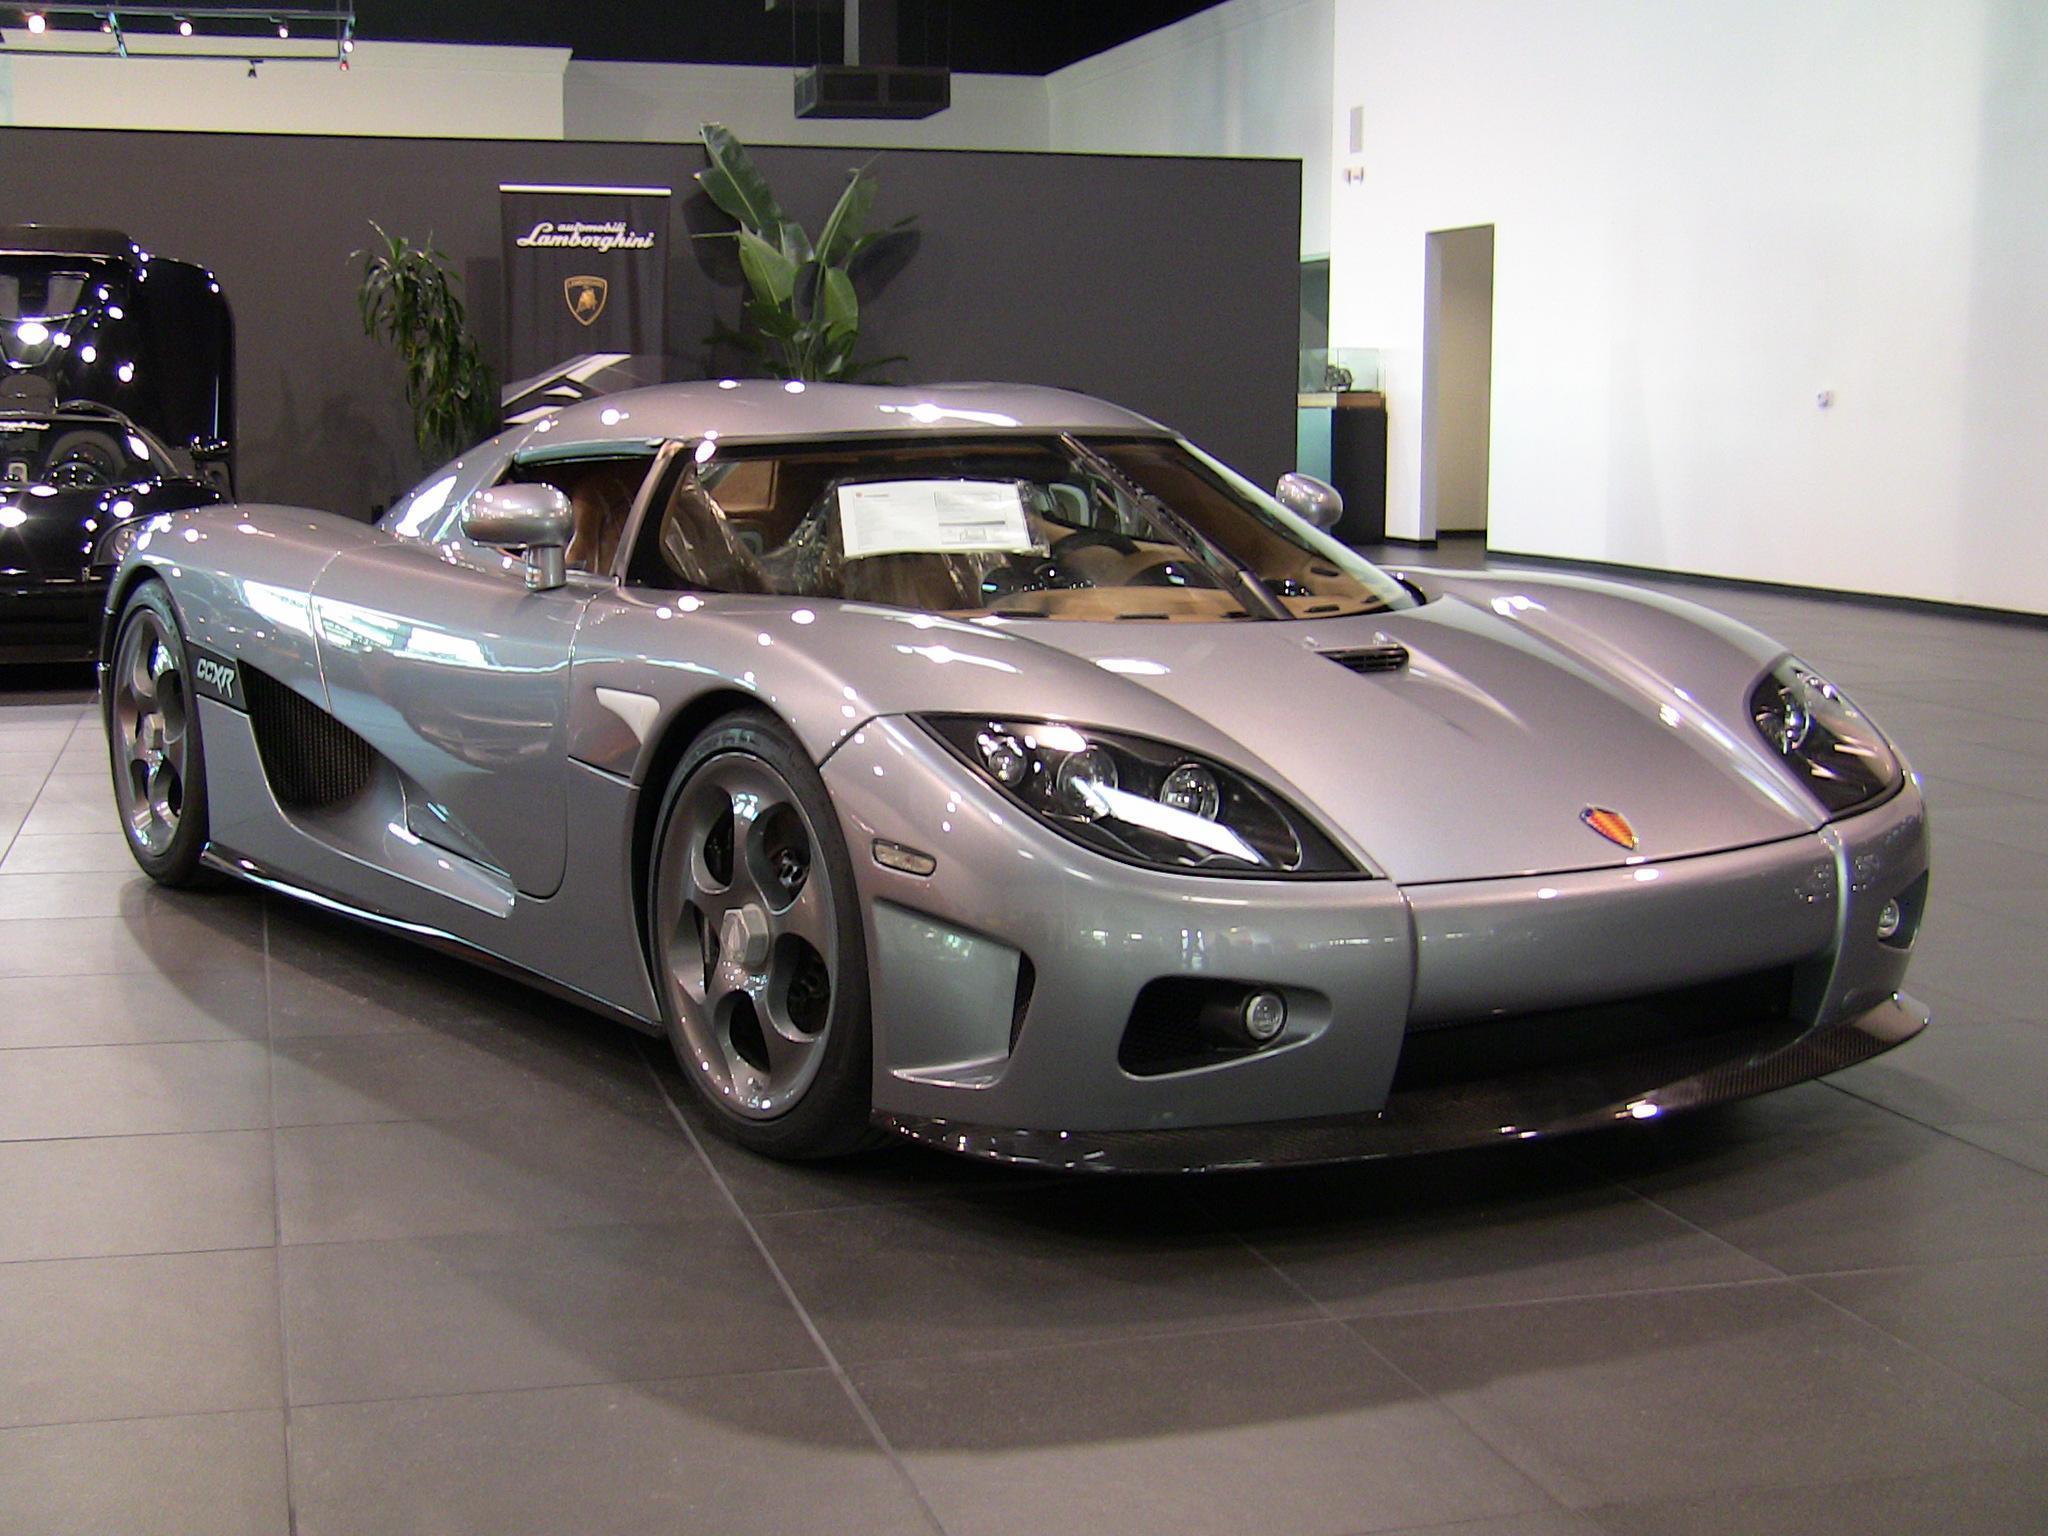 065 Koenigsegg